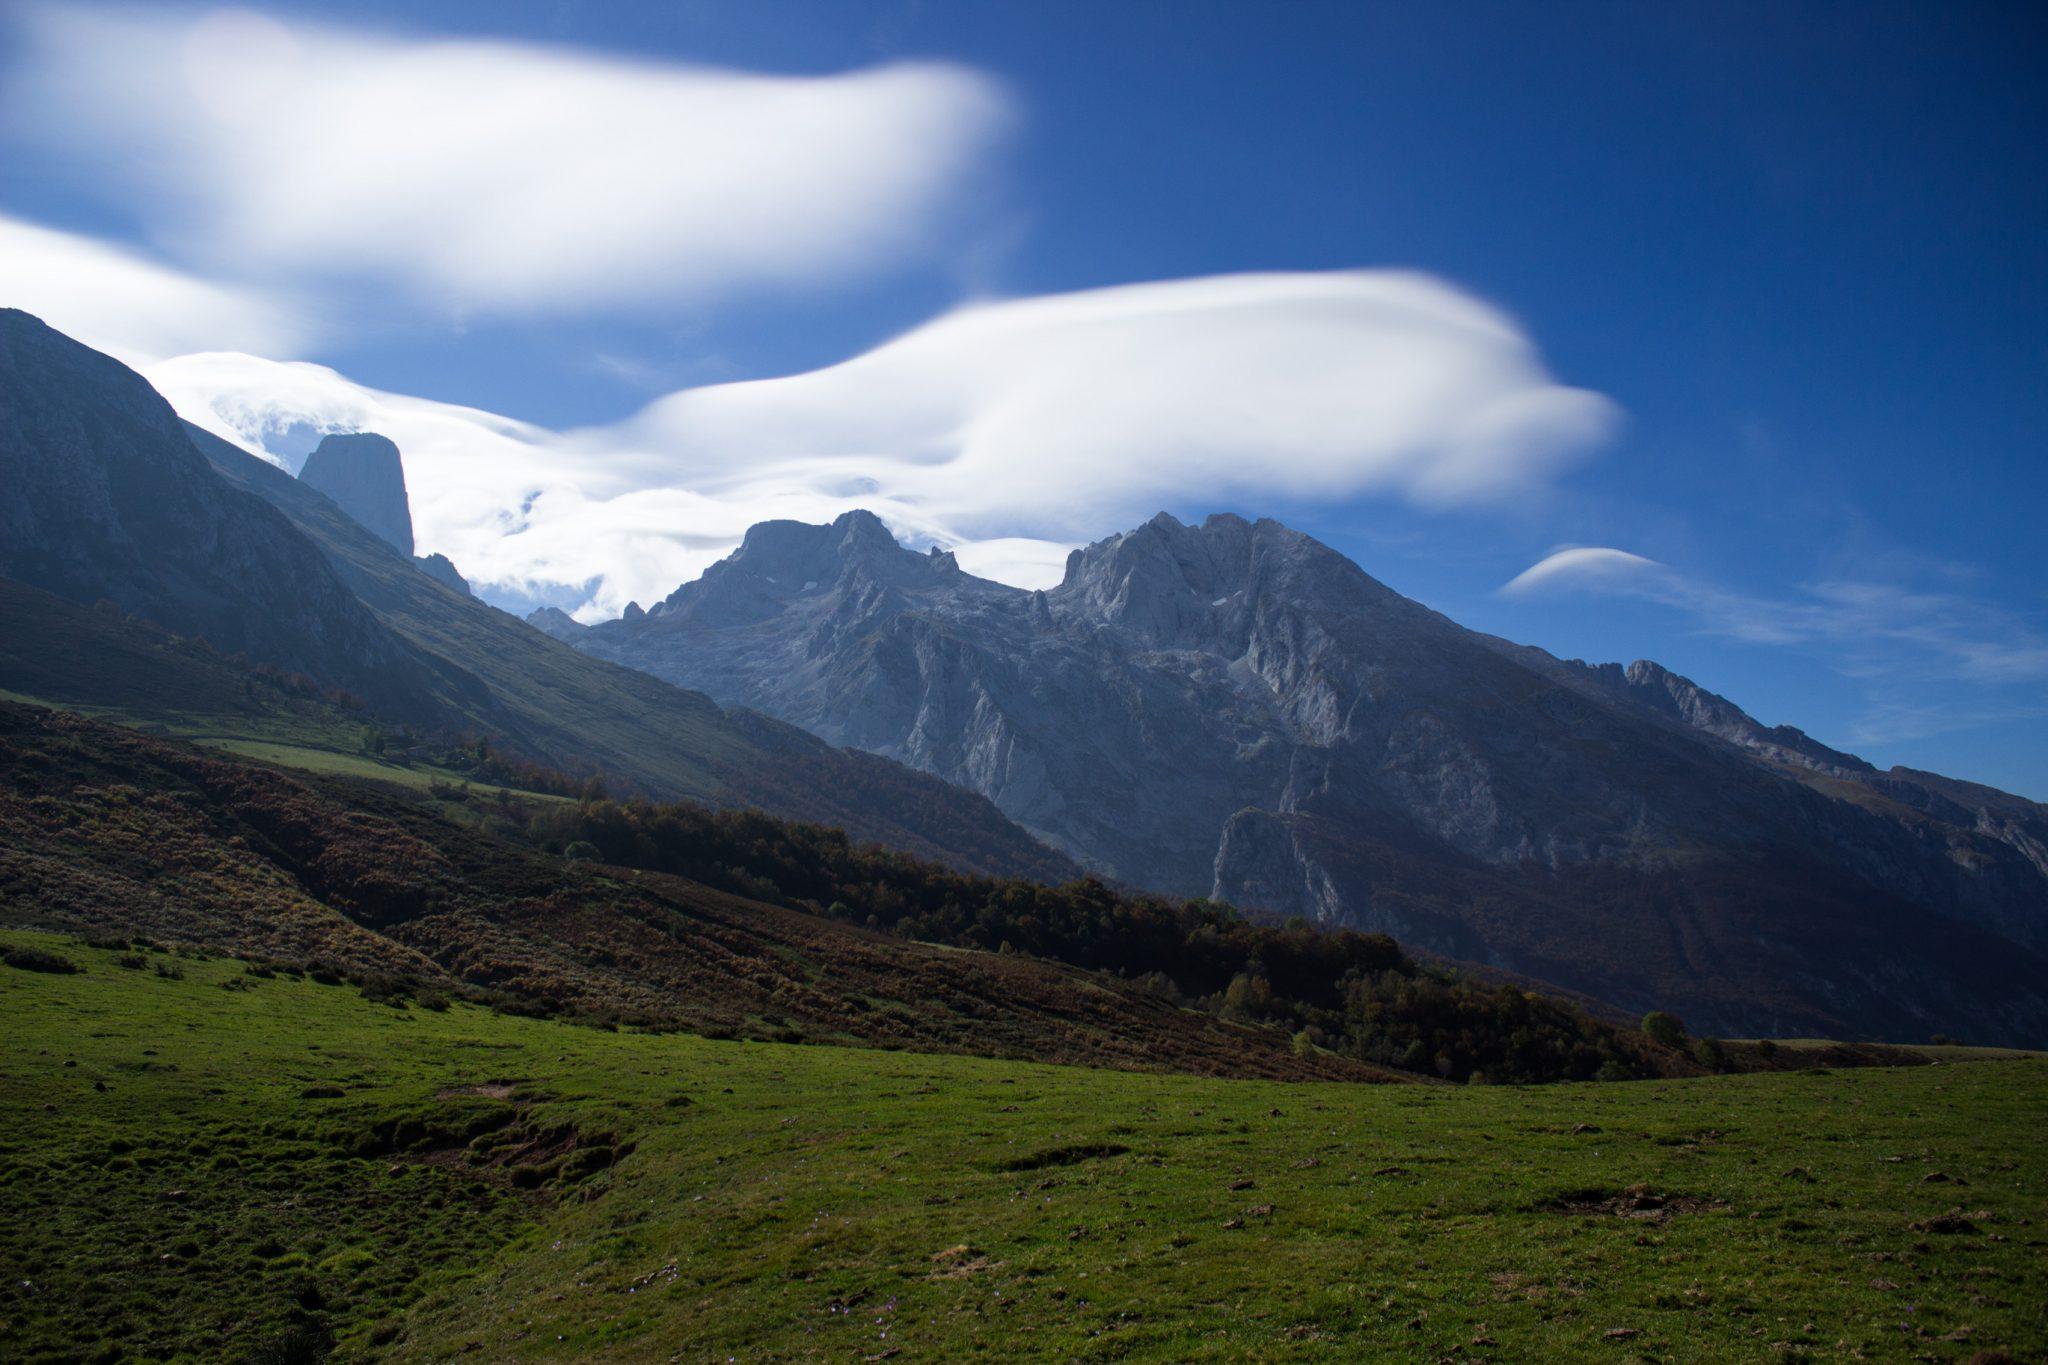 Wanderung Poncebos nach Bulnes in den Picos de Europa, Ausblick auf Berg Naranjo de Bulnes, auch Picu Urriellu, bekanntester Berg in Picos de Europa, auf der Ebene Collado de Pandebano